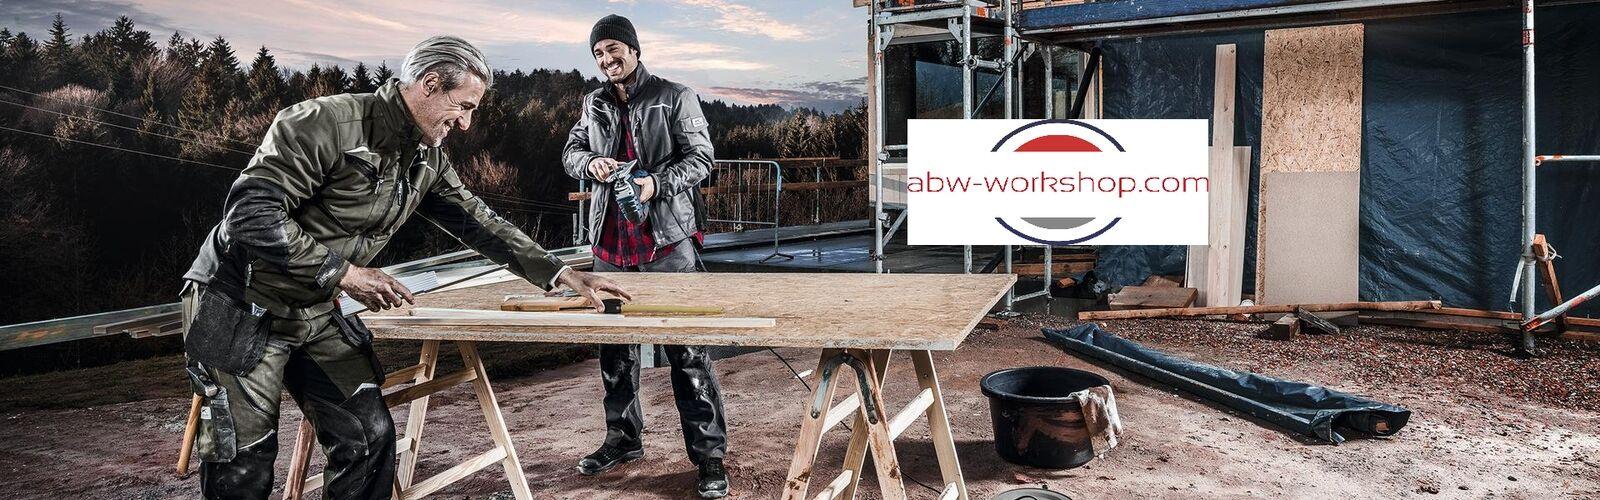 abw-workshop.com